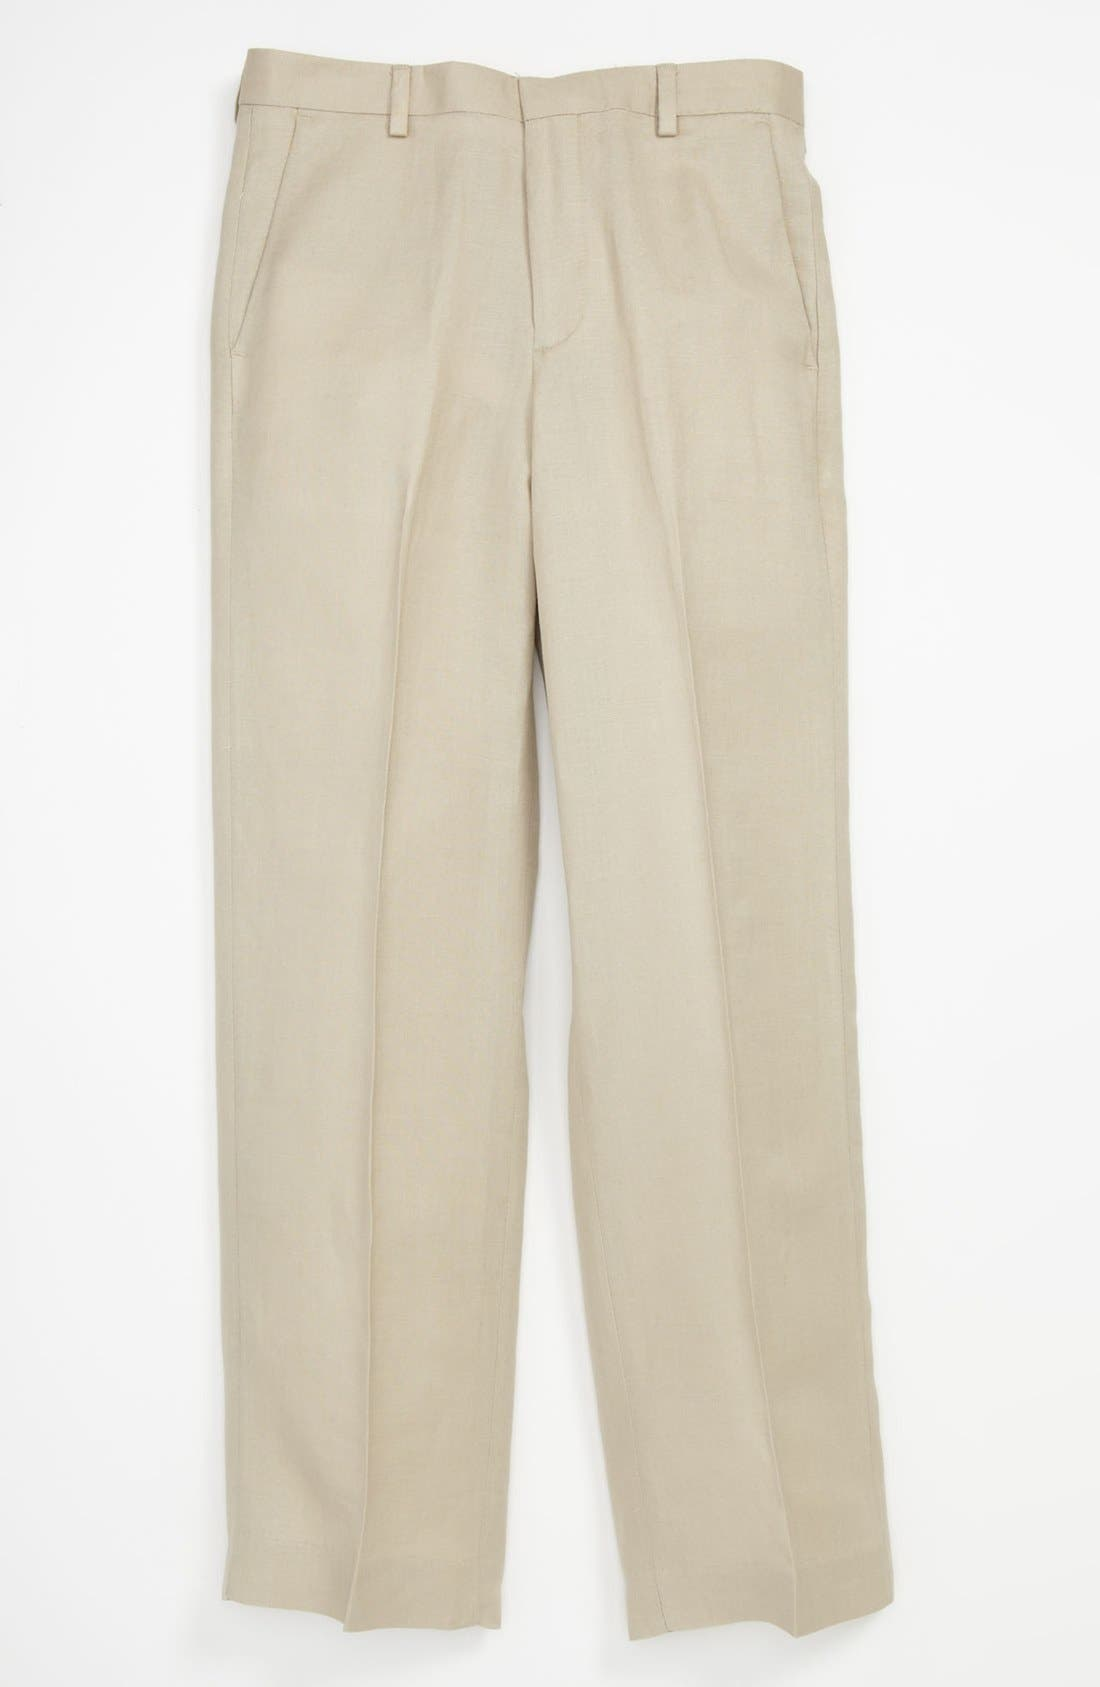 Alternate Image 1 Selected - Nordstrom 'Phillip' Linen Blend Trousers (Little Boys & Big Boys)